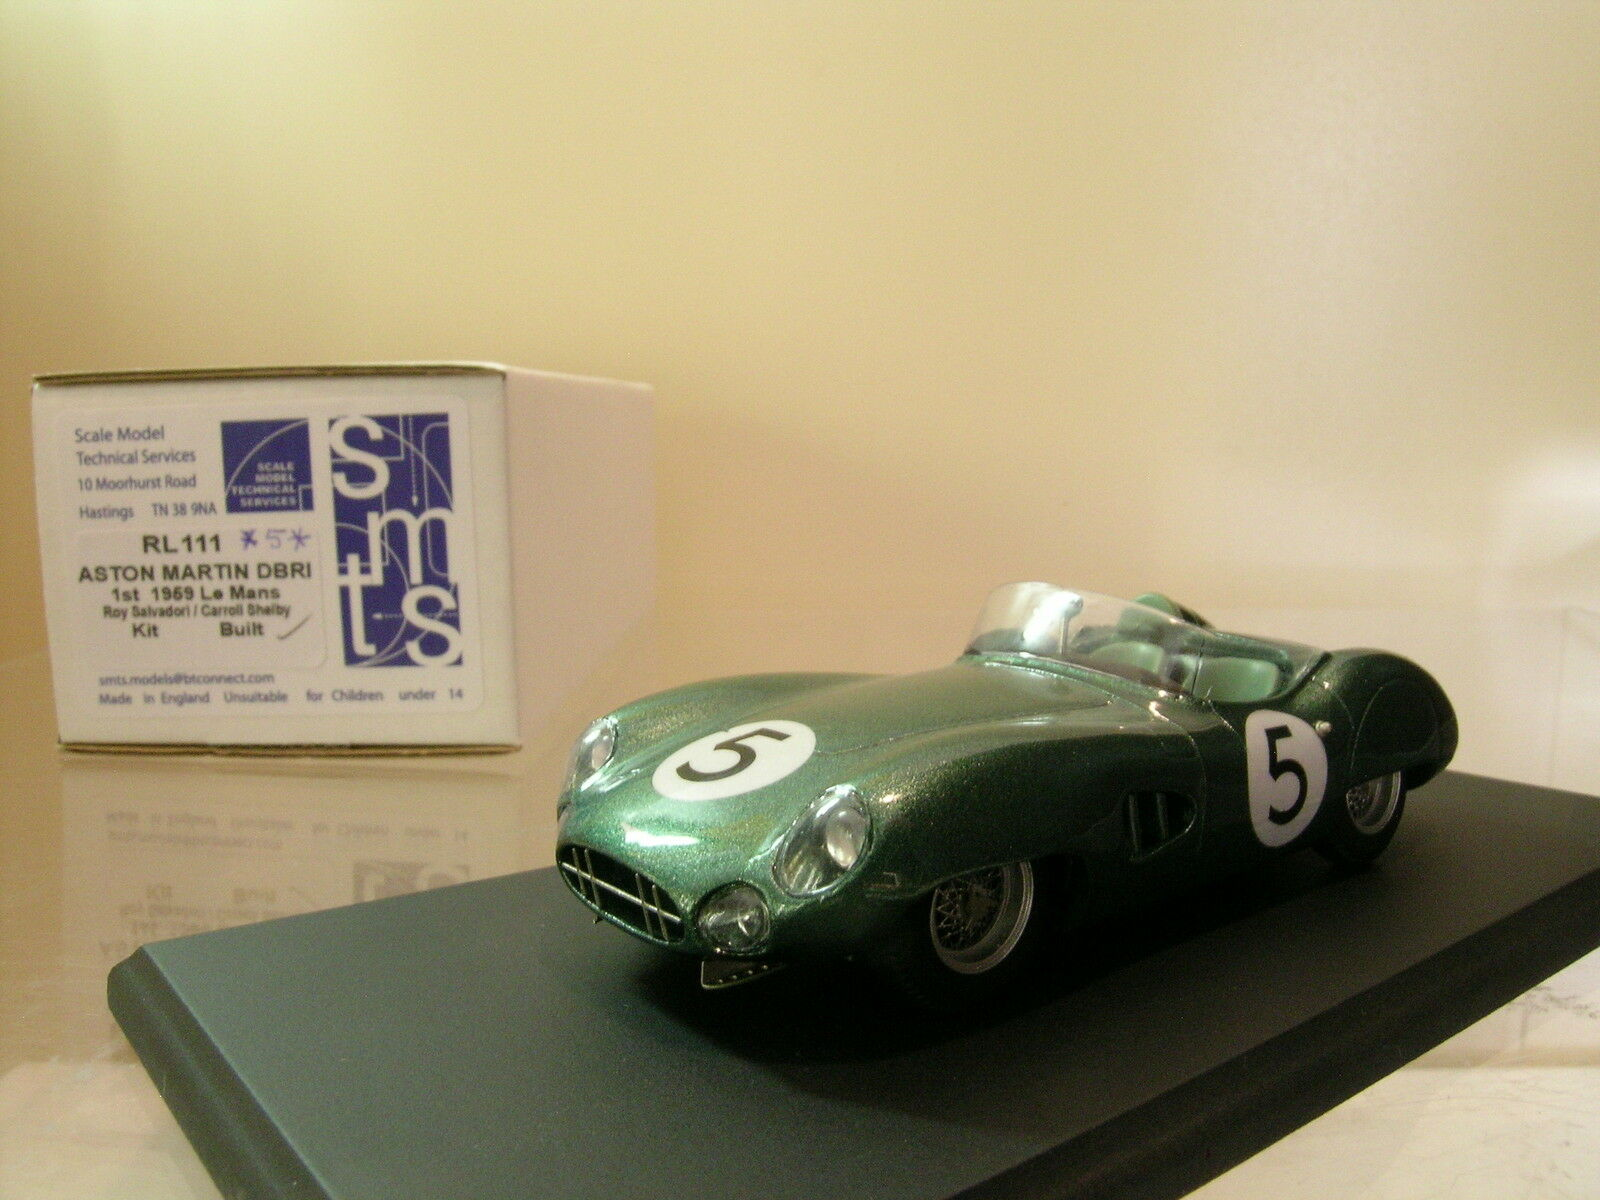 SMTS-MODELS RL111 ASTON MARTIN DBR1 1ST LEMANS 1959 *5* BOXED 1:43